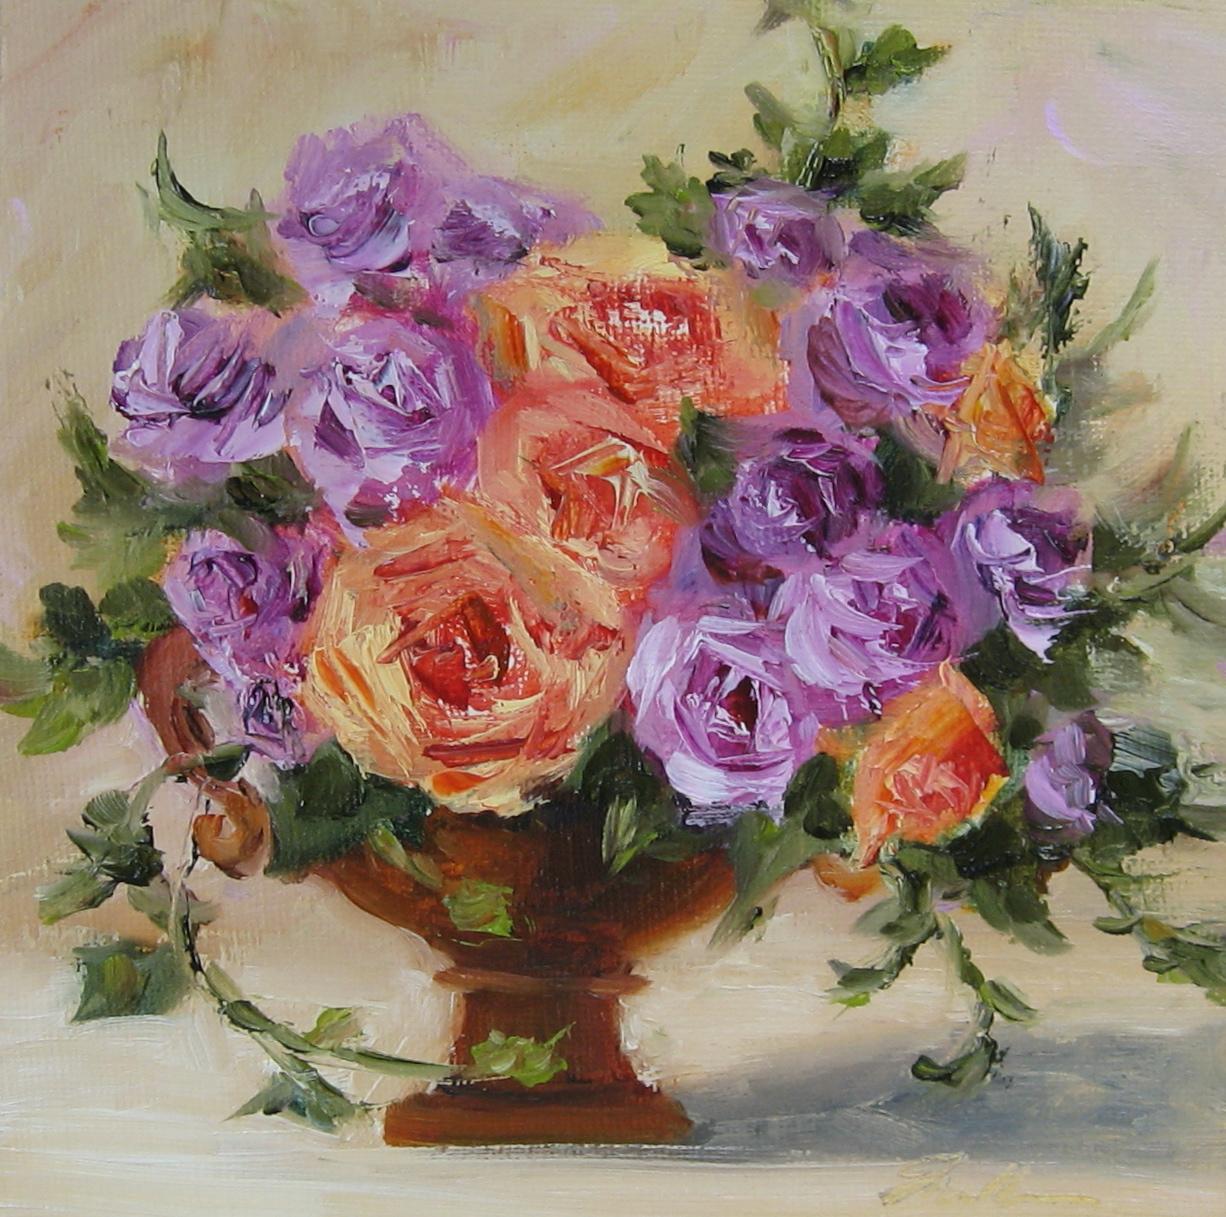 """Flower Study #33-Roses, limited palette"" original fine art by Pat Fiorello"